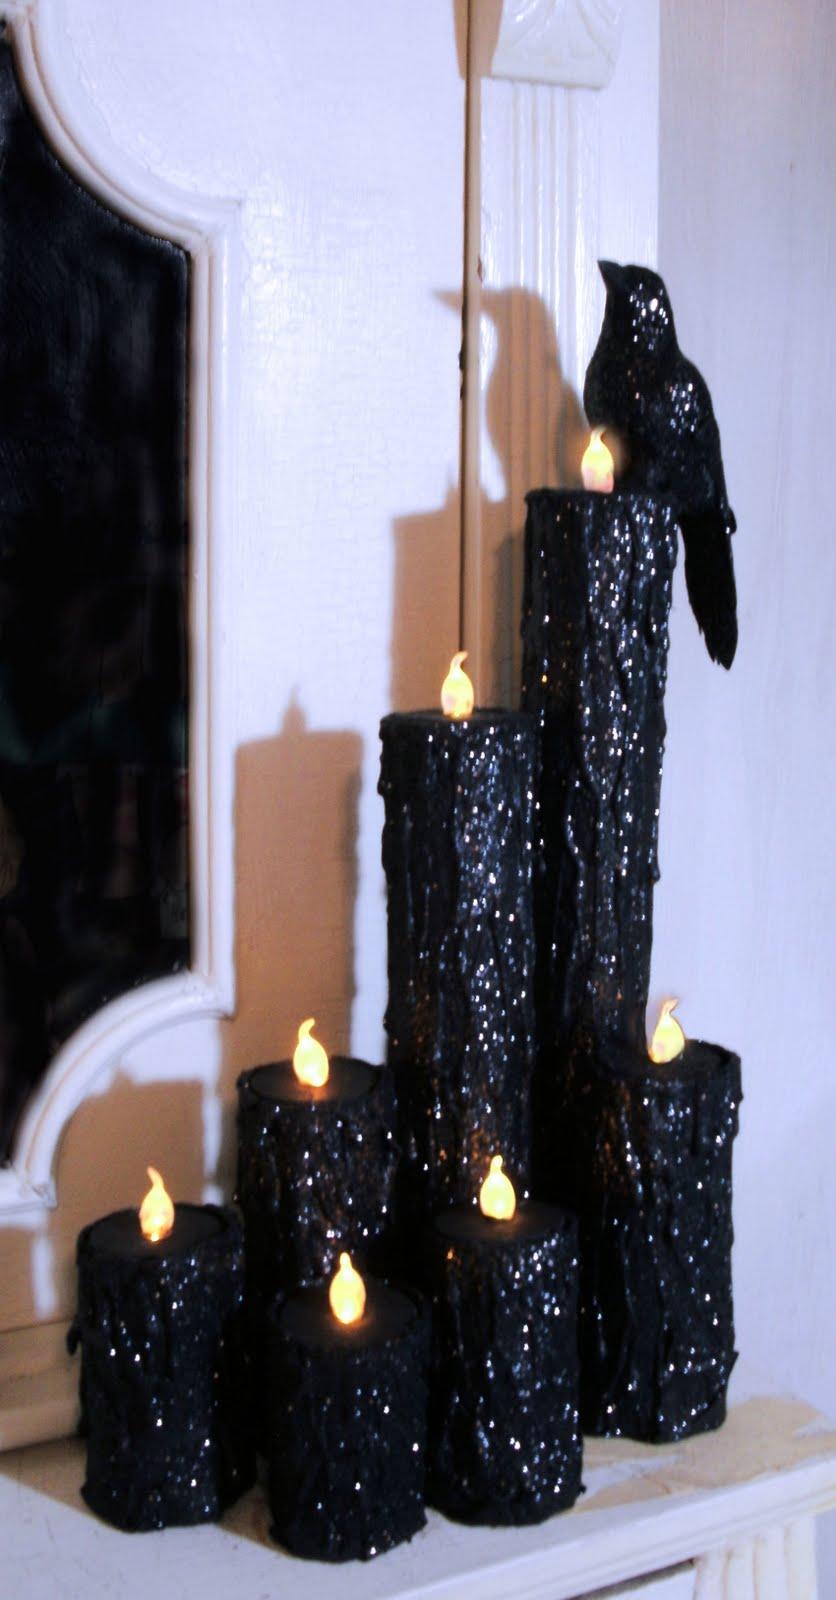 house of dewberry diy halloween creepy candles. Black Bedroom Furniture Sets. Home Design Ideas